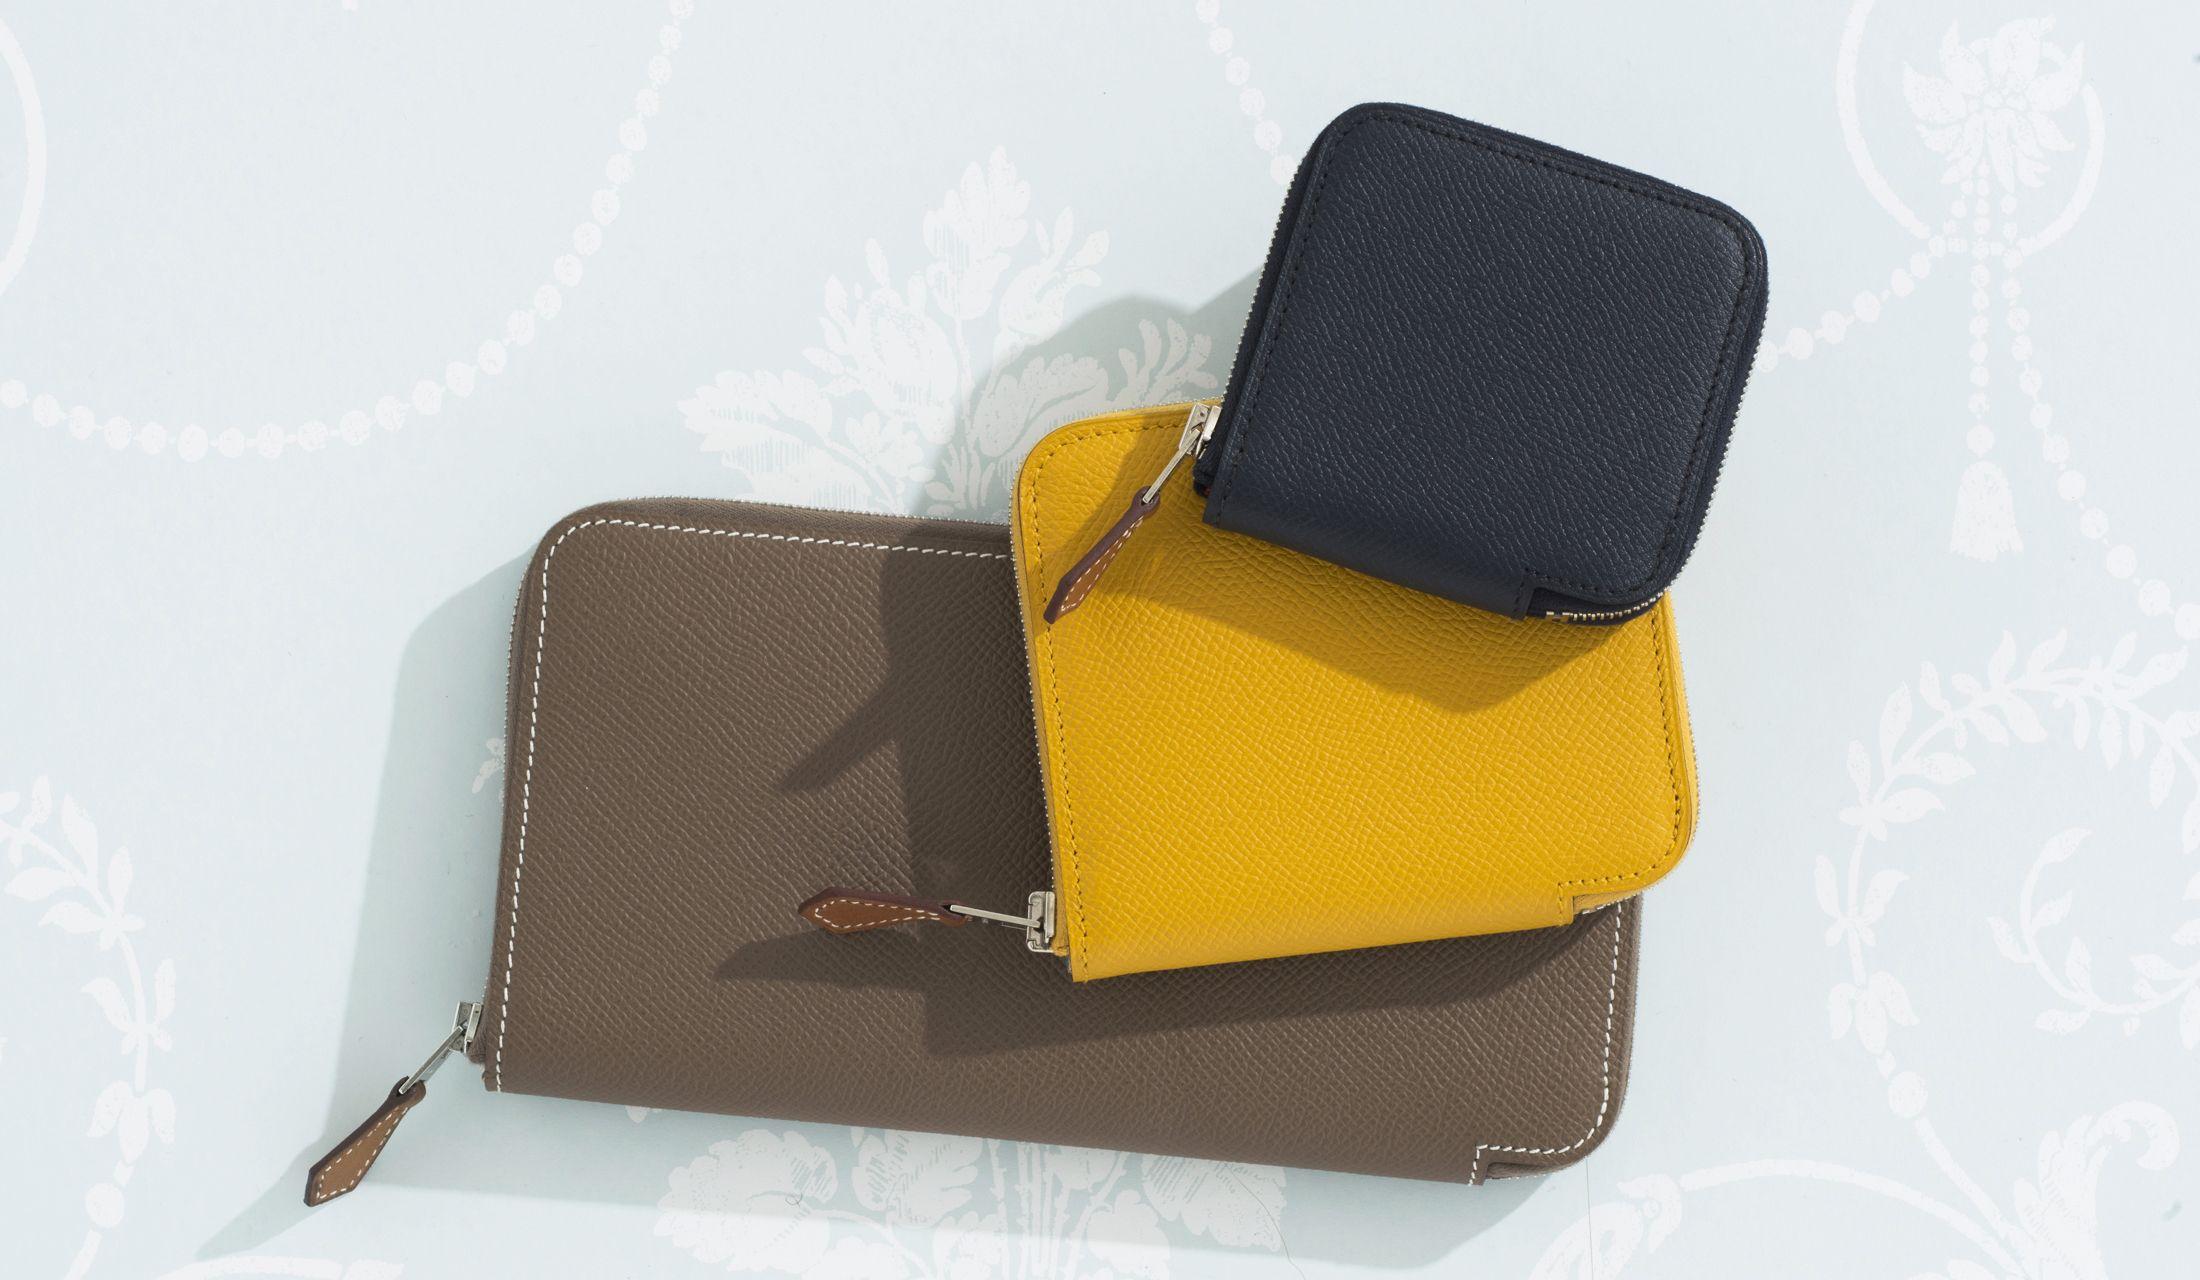 HERMÈS(エルメス)の「SILK IN(シルクイン)」の新作財布の写真